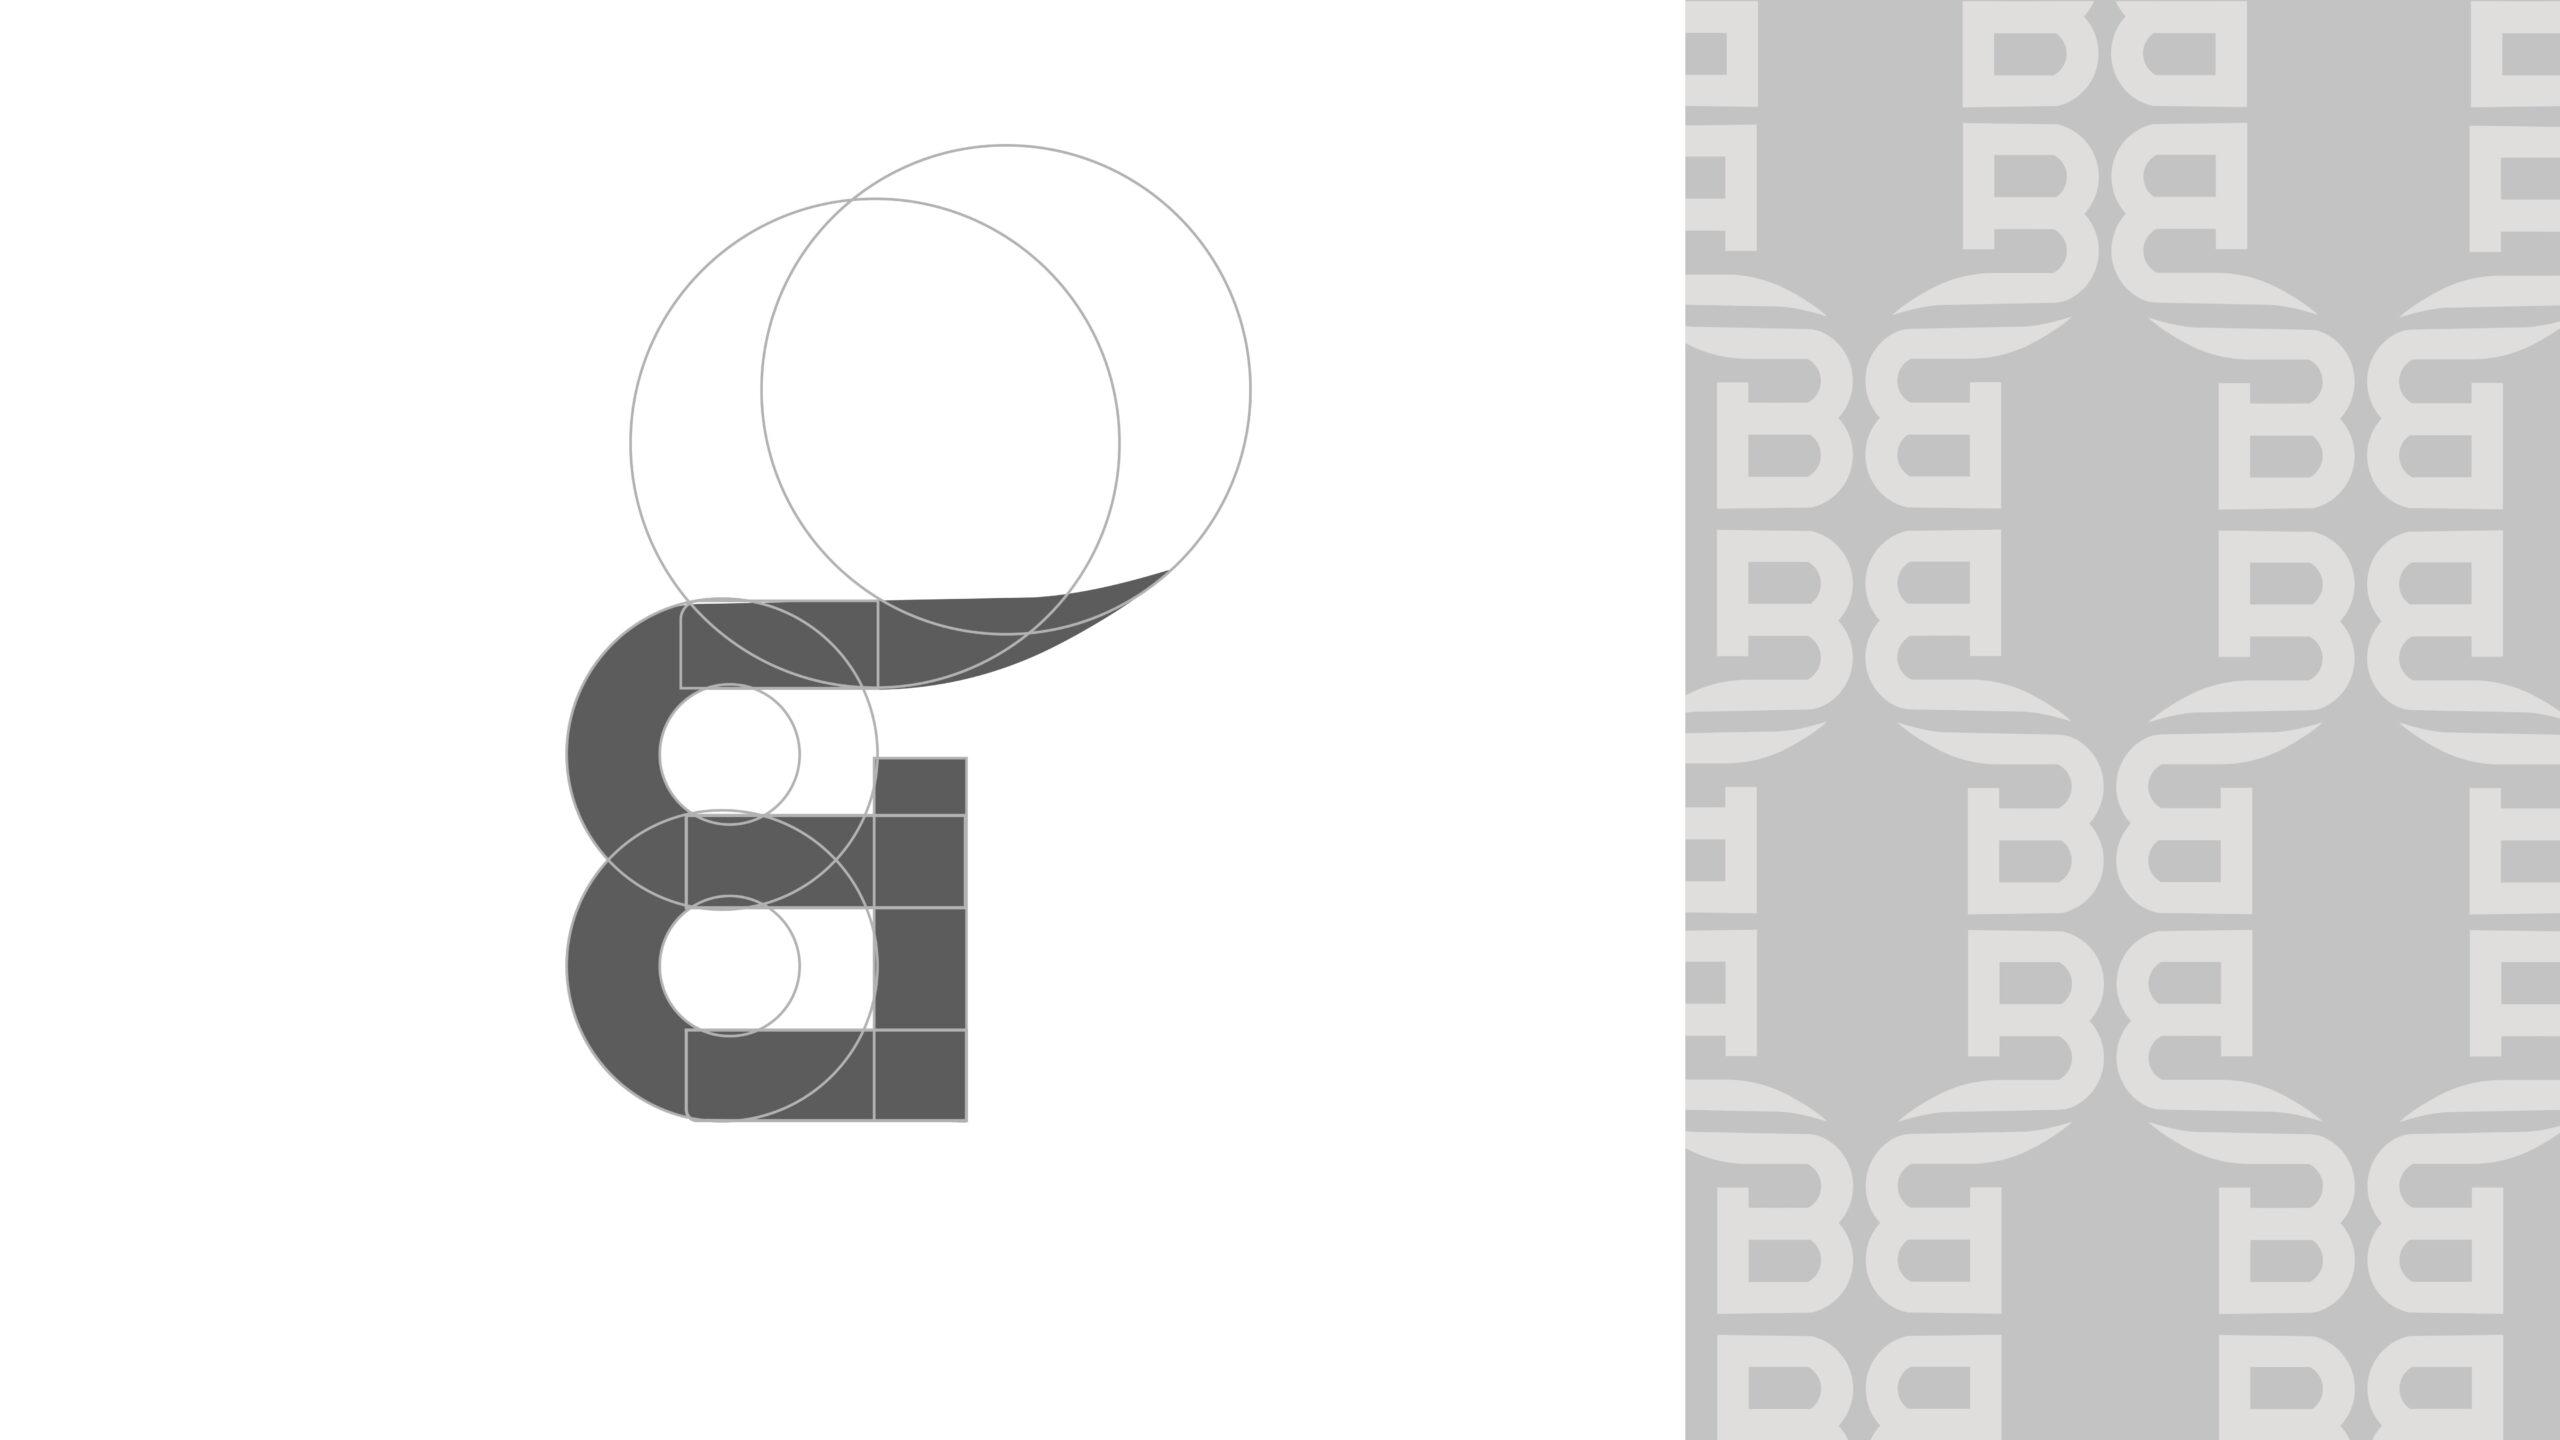 BB-Redesign-Case-Study2